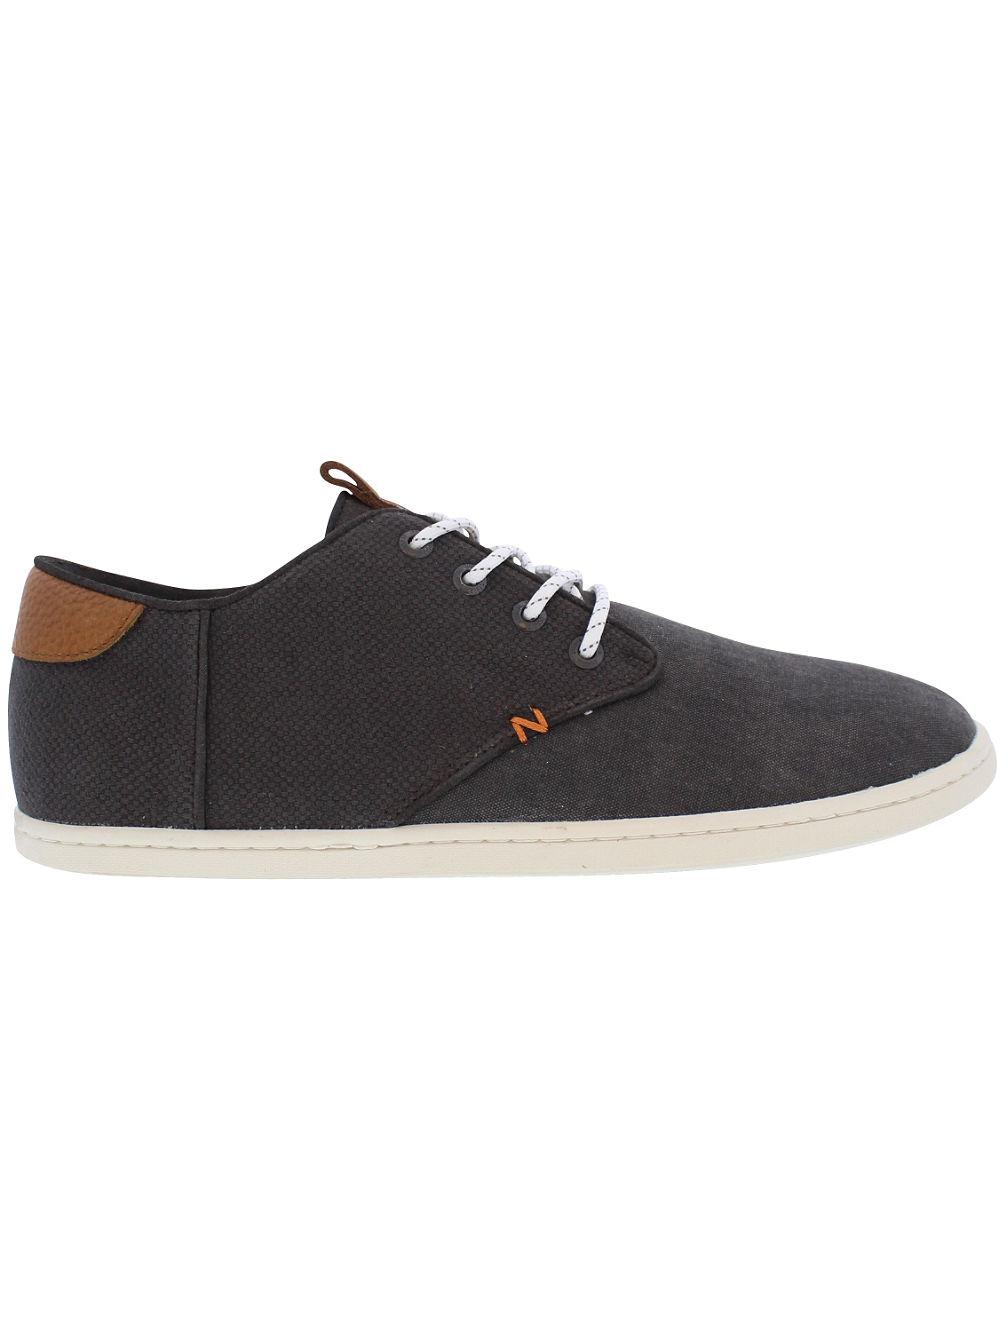 hub-chuck-onian-sneakers